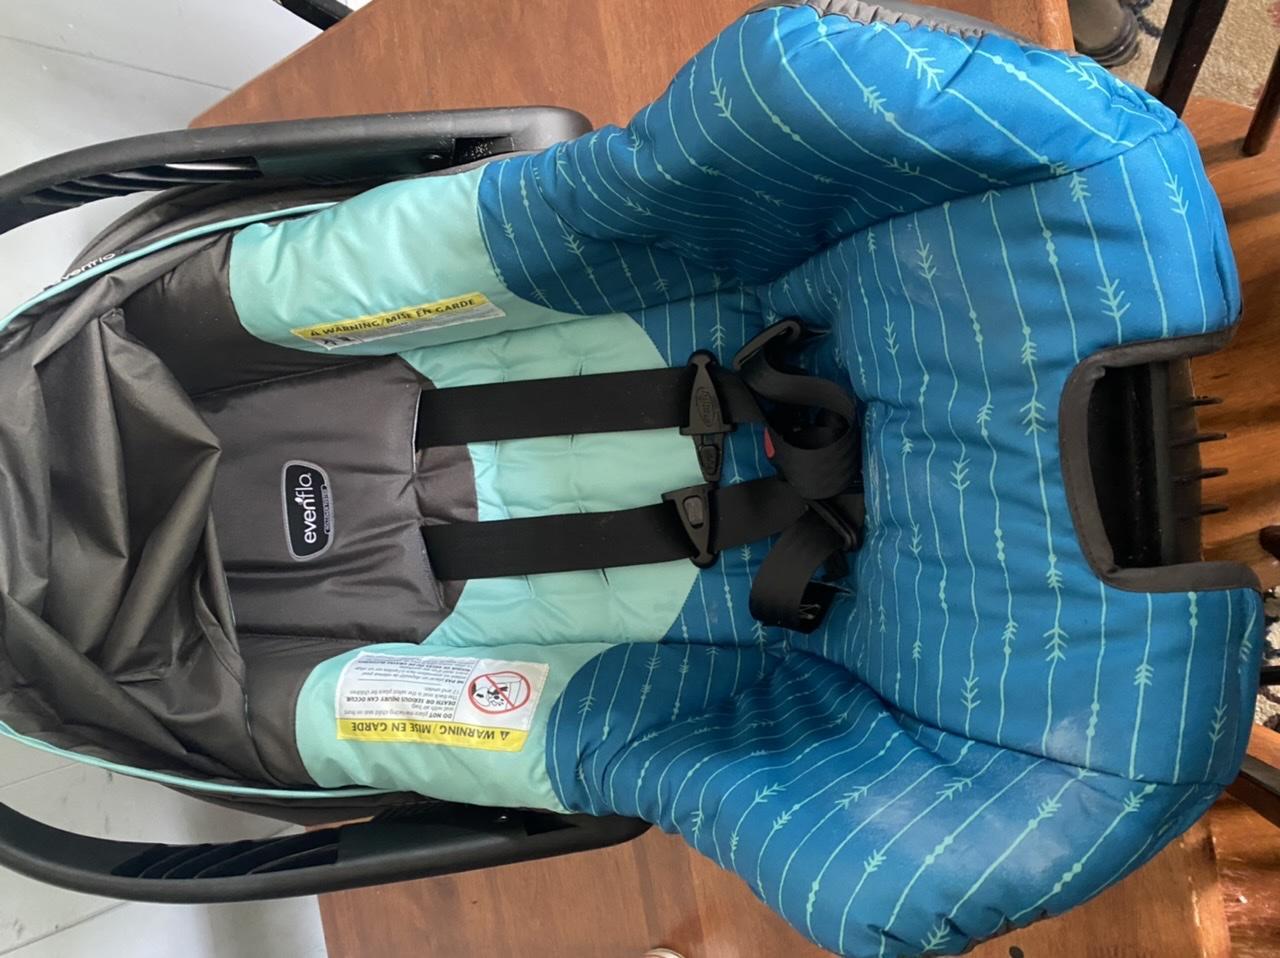 Evenflo infant carrier